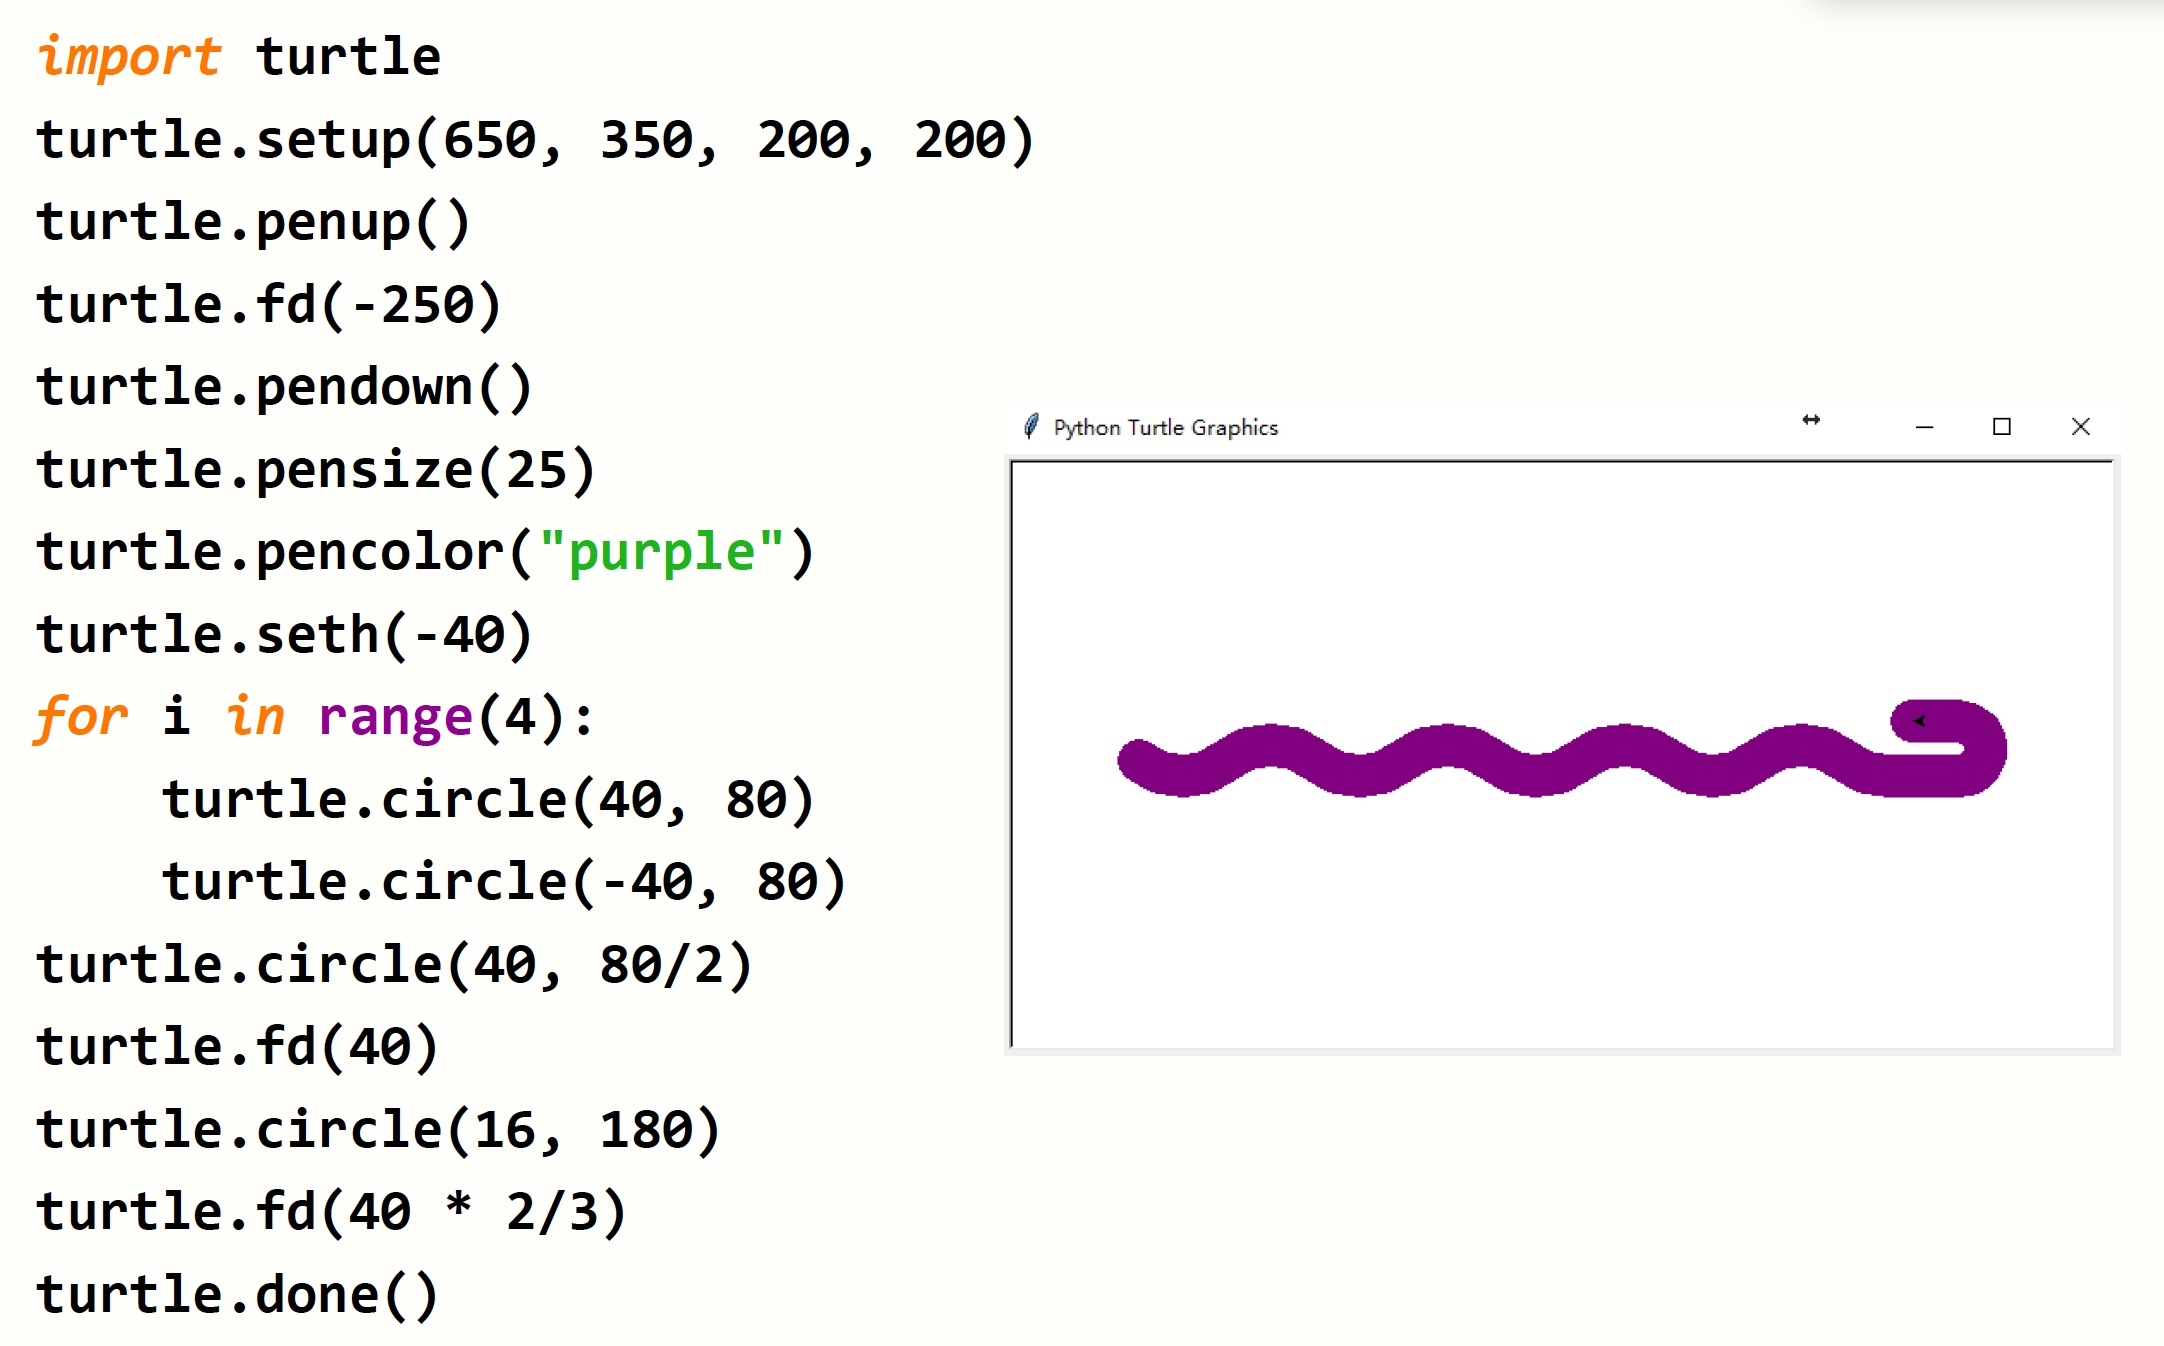 013-turtle程序语法元素分析-14.jpg?x-oss-process=style/watermark